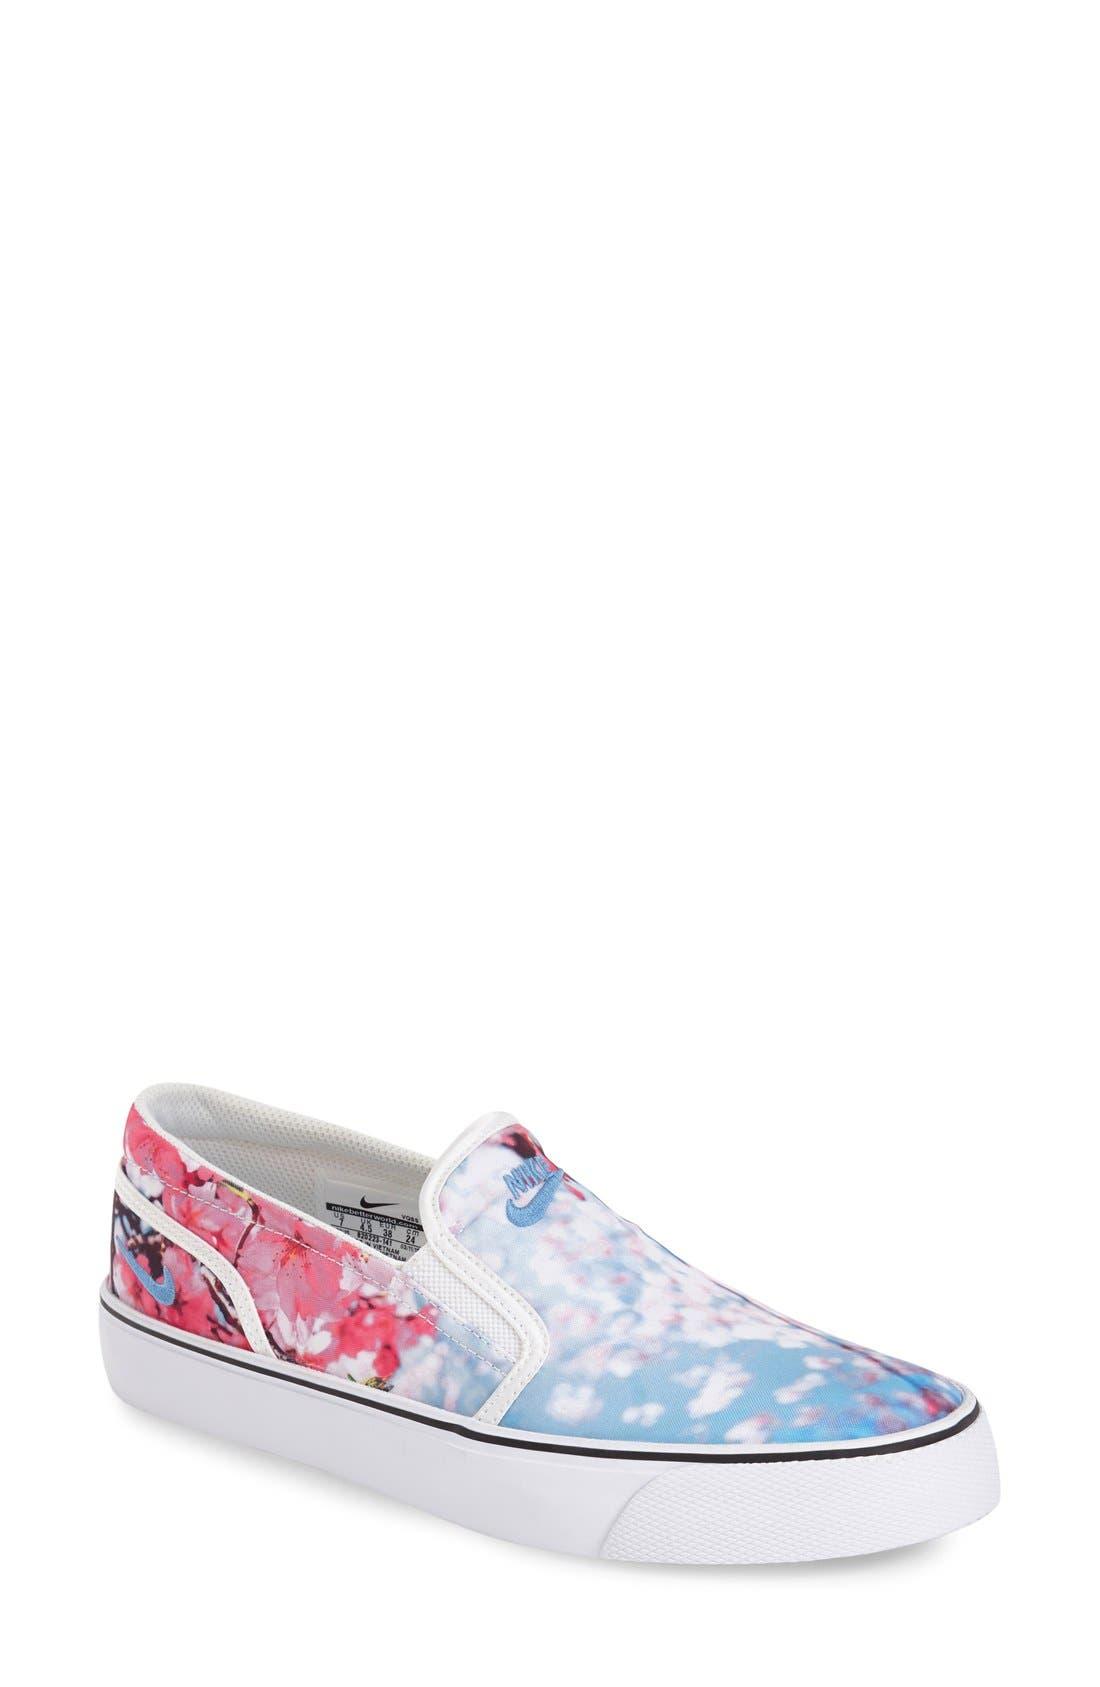 Main Image - Nike 'Toki' Print Slip-On Sneaker (Women)